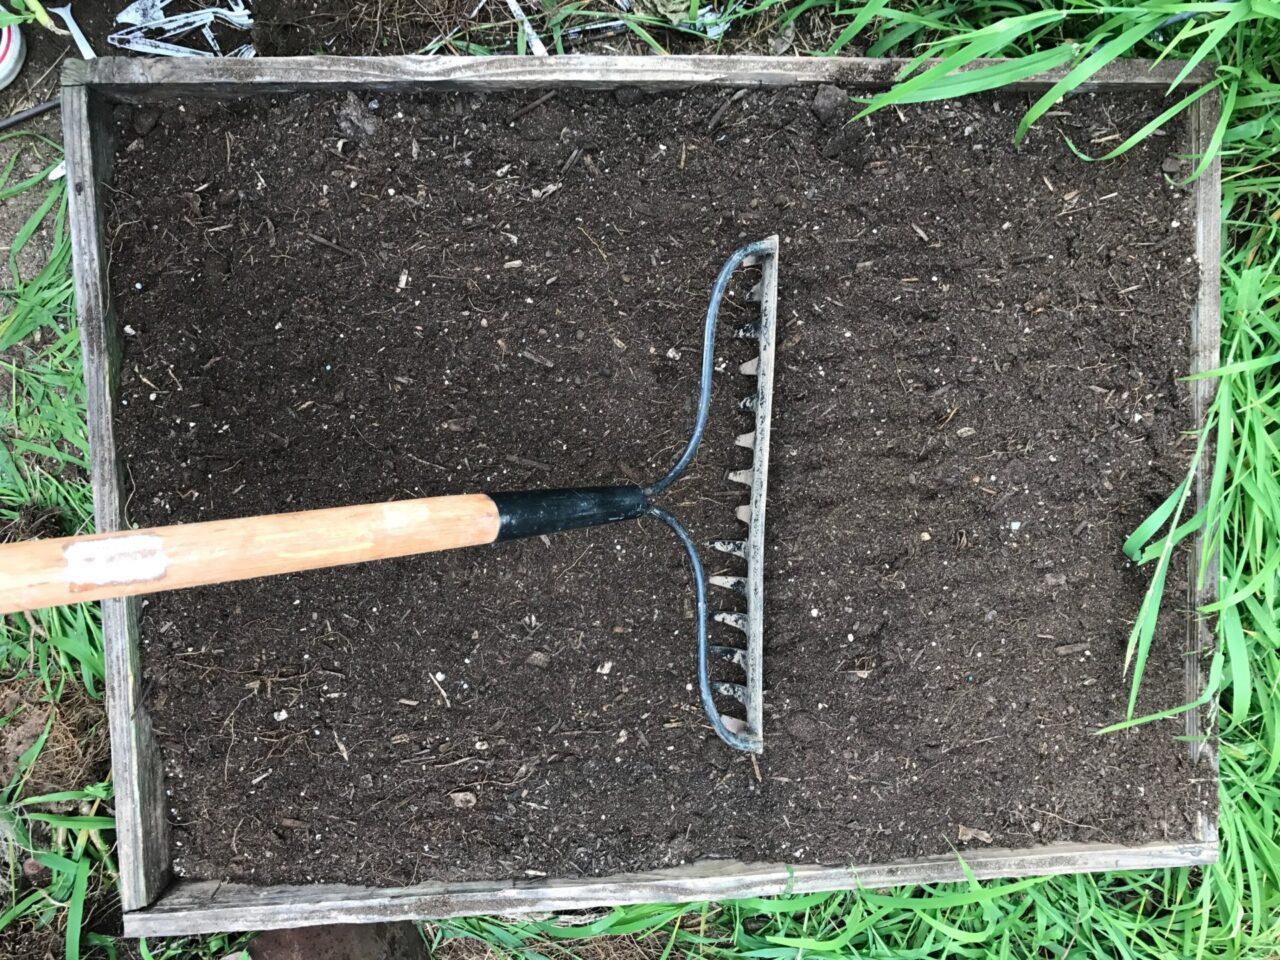 rake the soil even